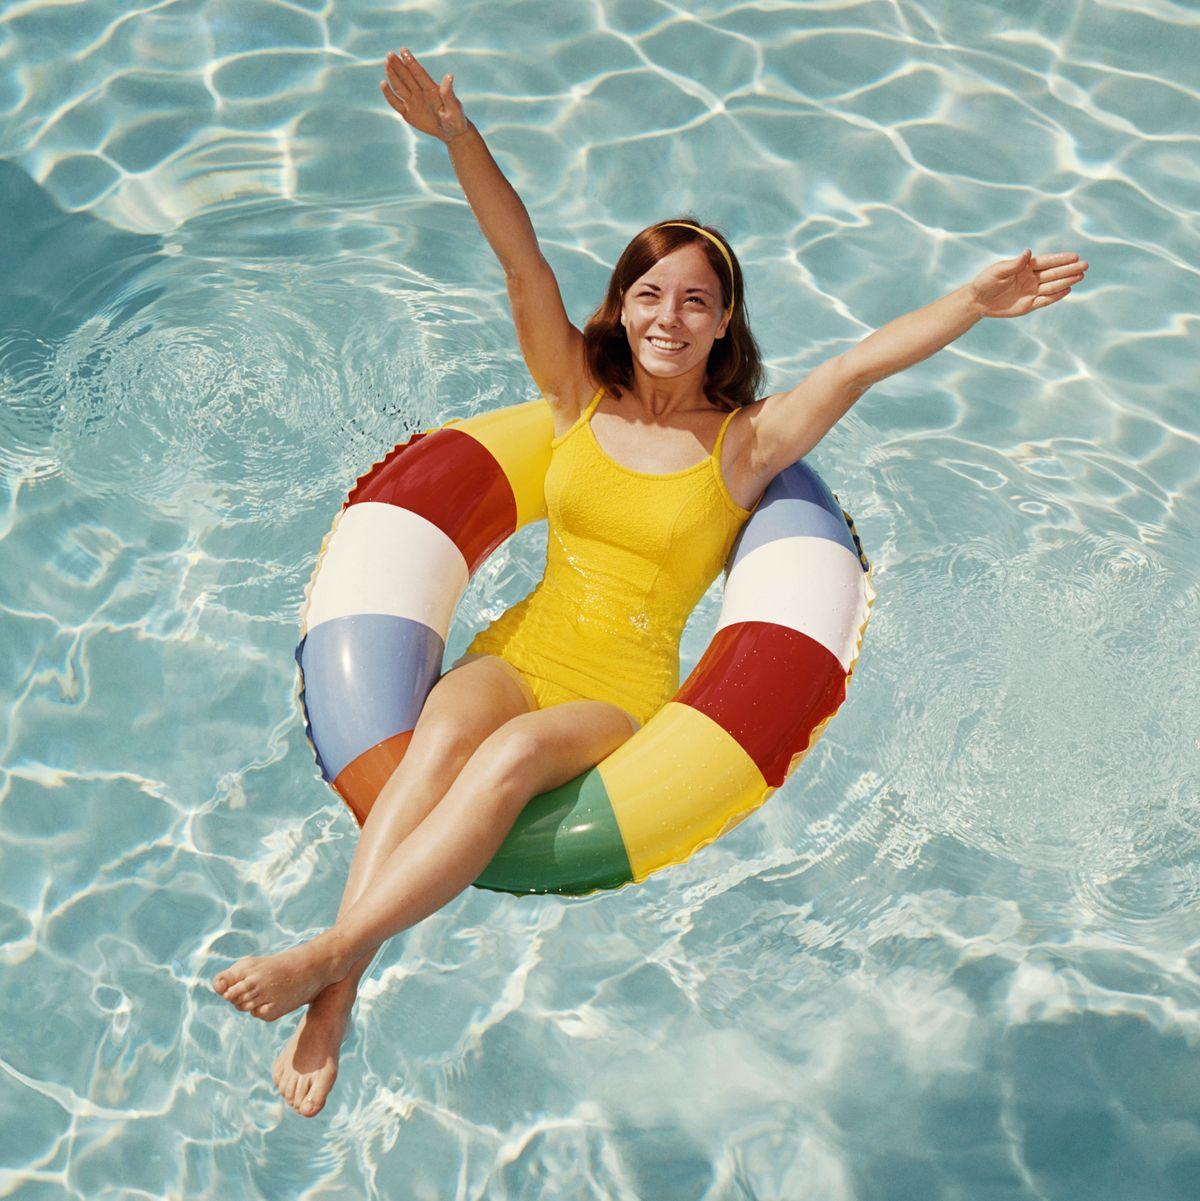 13 Best Pool Floats 2019 | The Strategist | New York Magazine